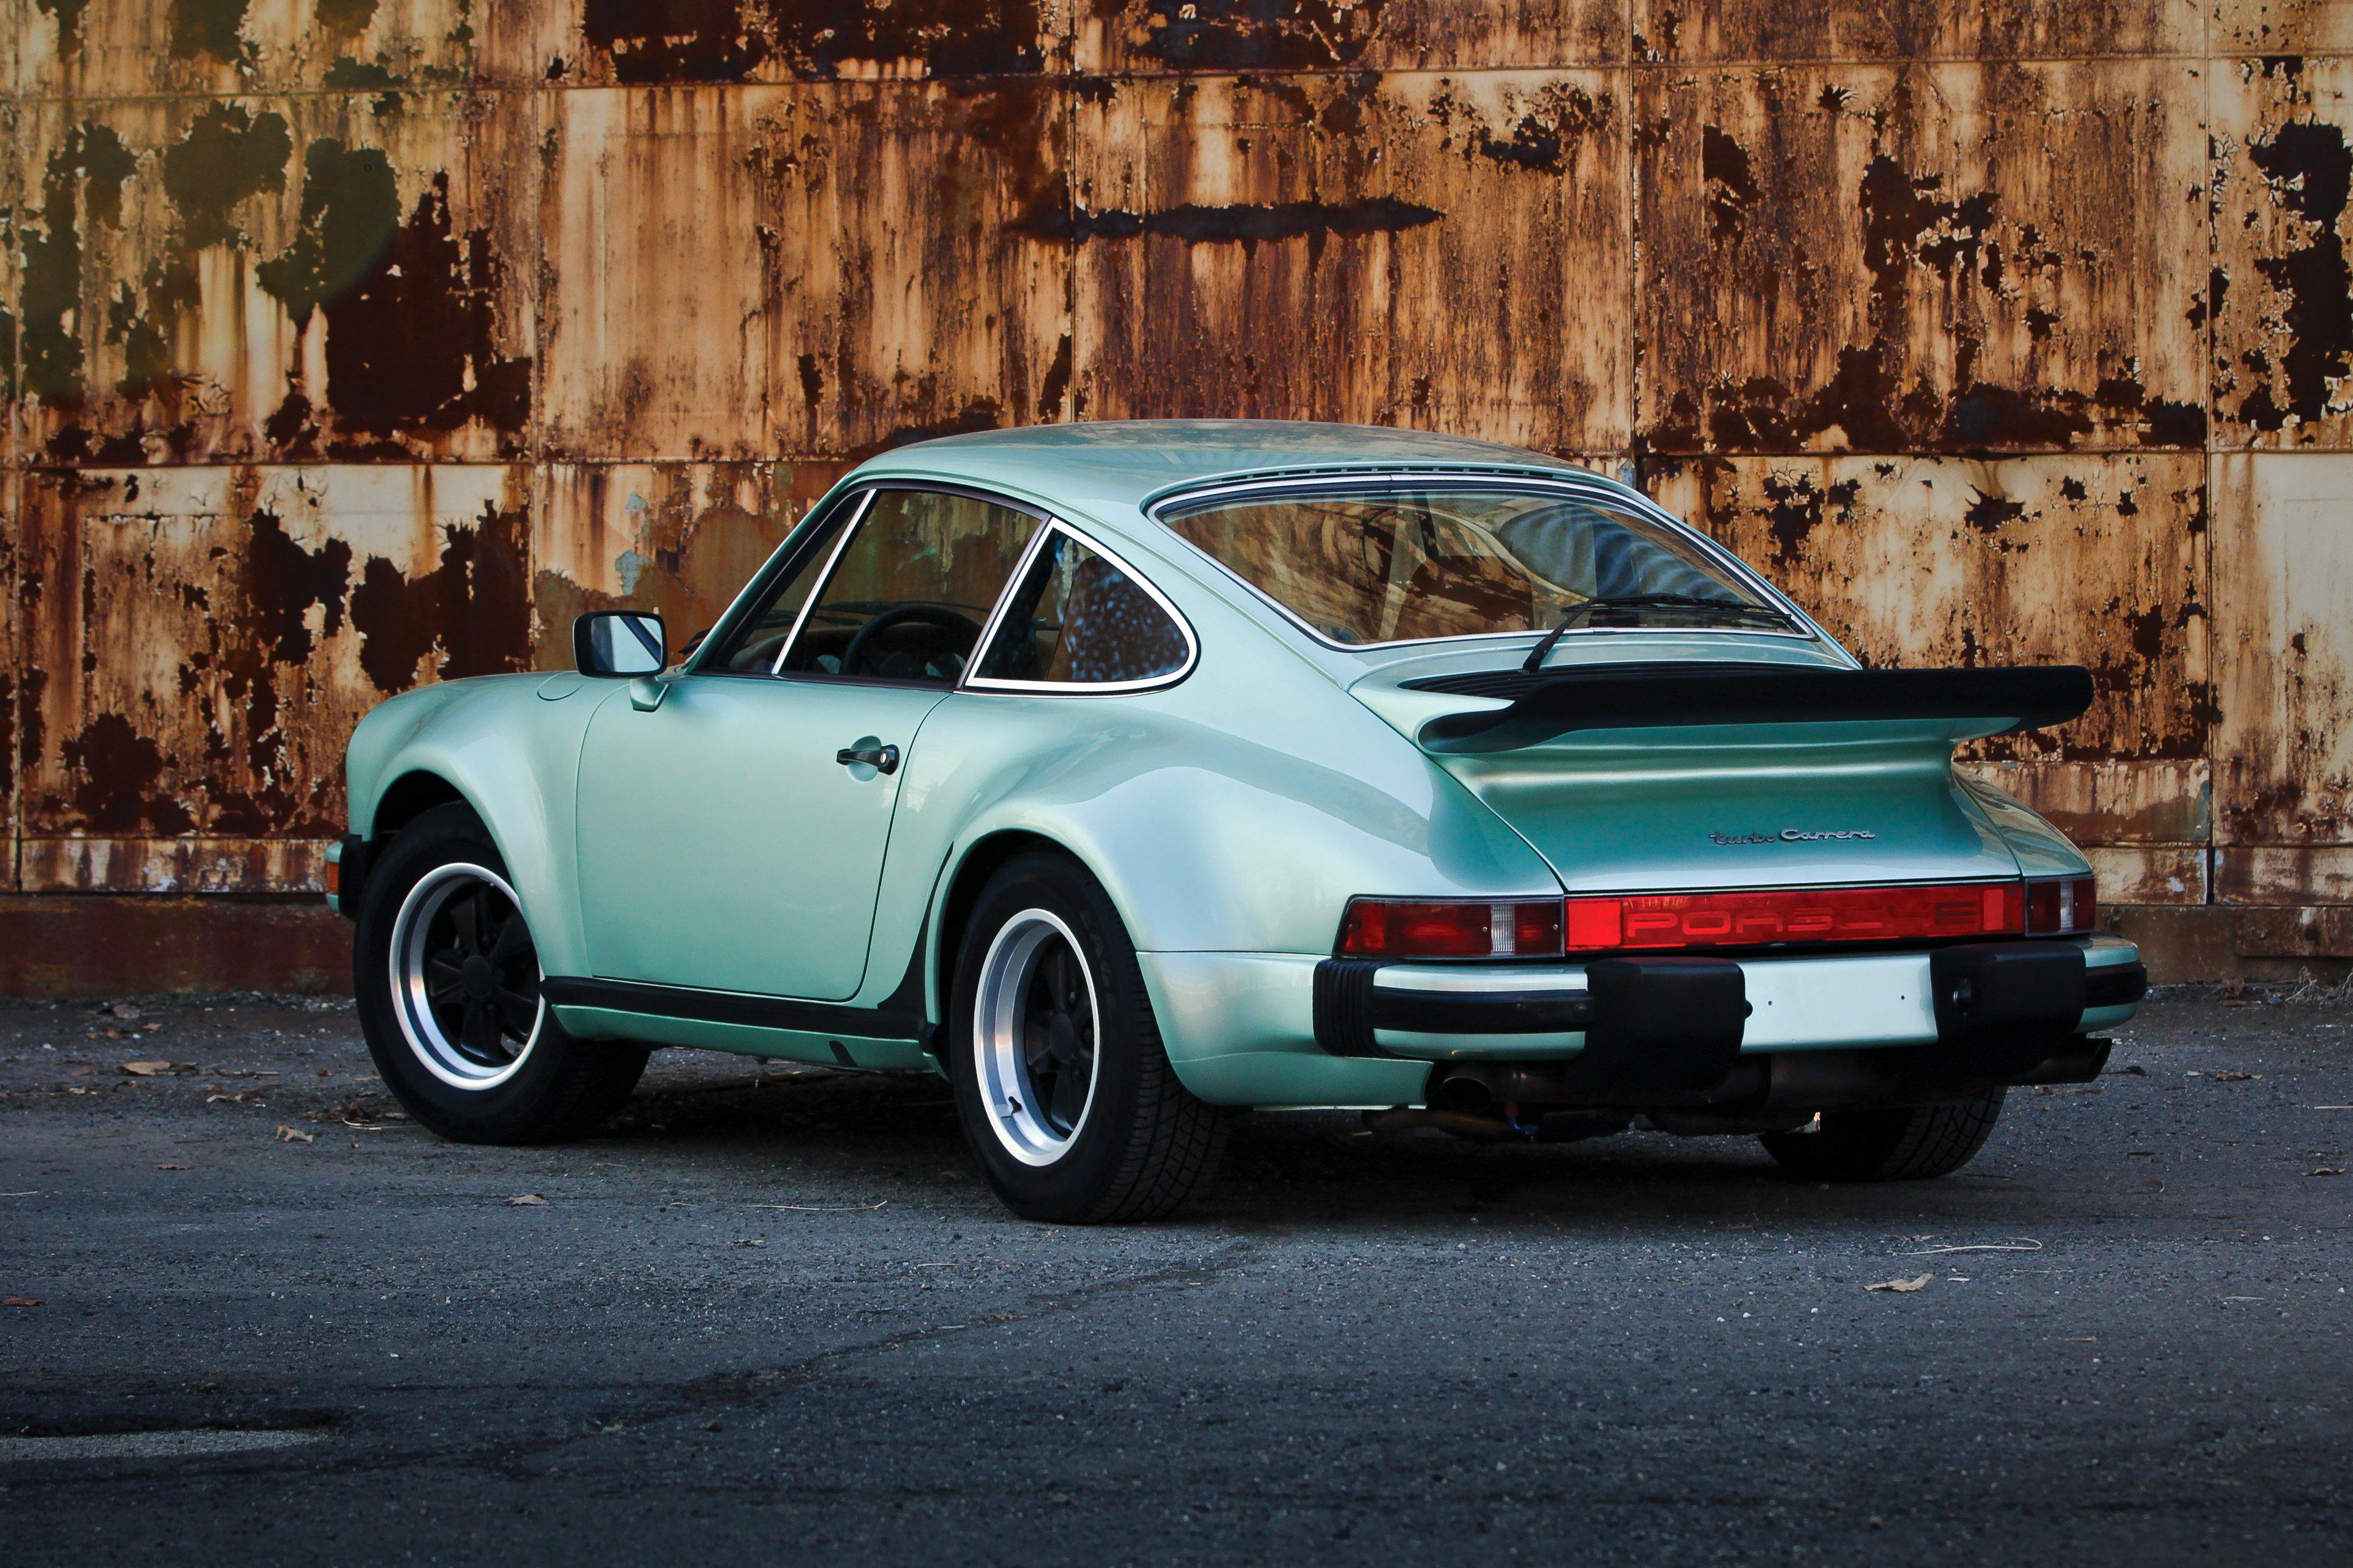 Wallpaper 1920x1080 Dark >> 1976 Porsche Turbo 911 Carrera 930 cars wallpaper | 4096x2730 | 629284 | WallpaperUP